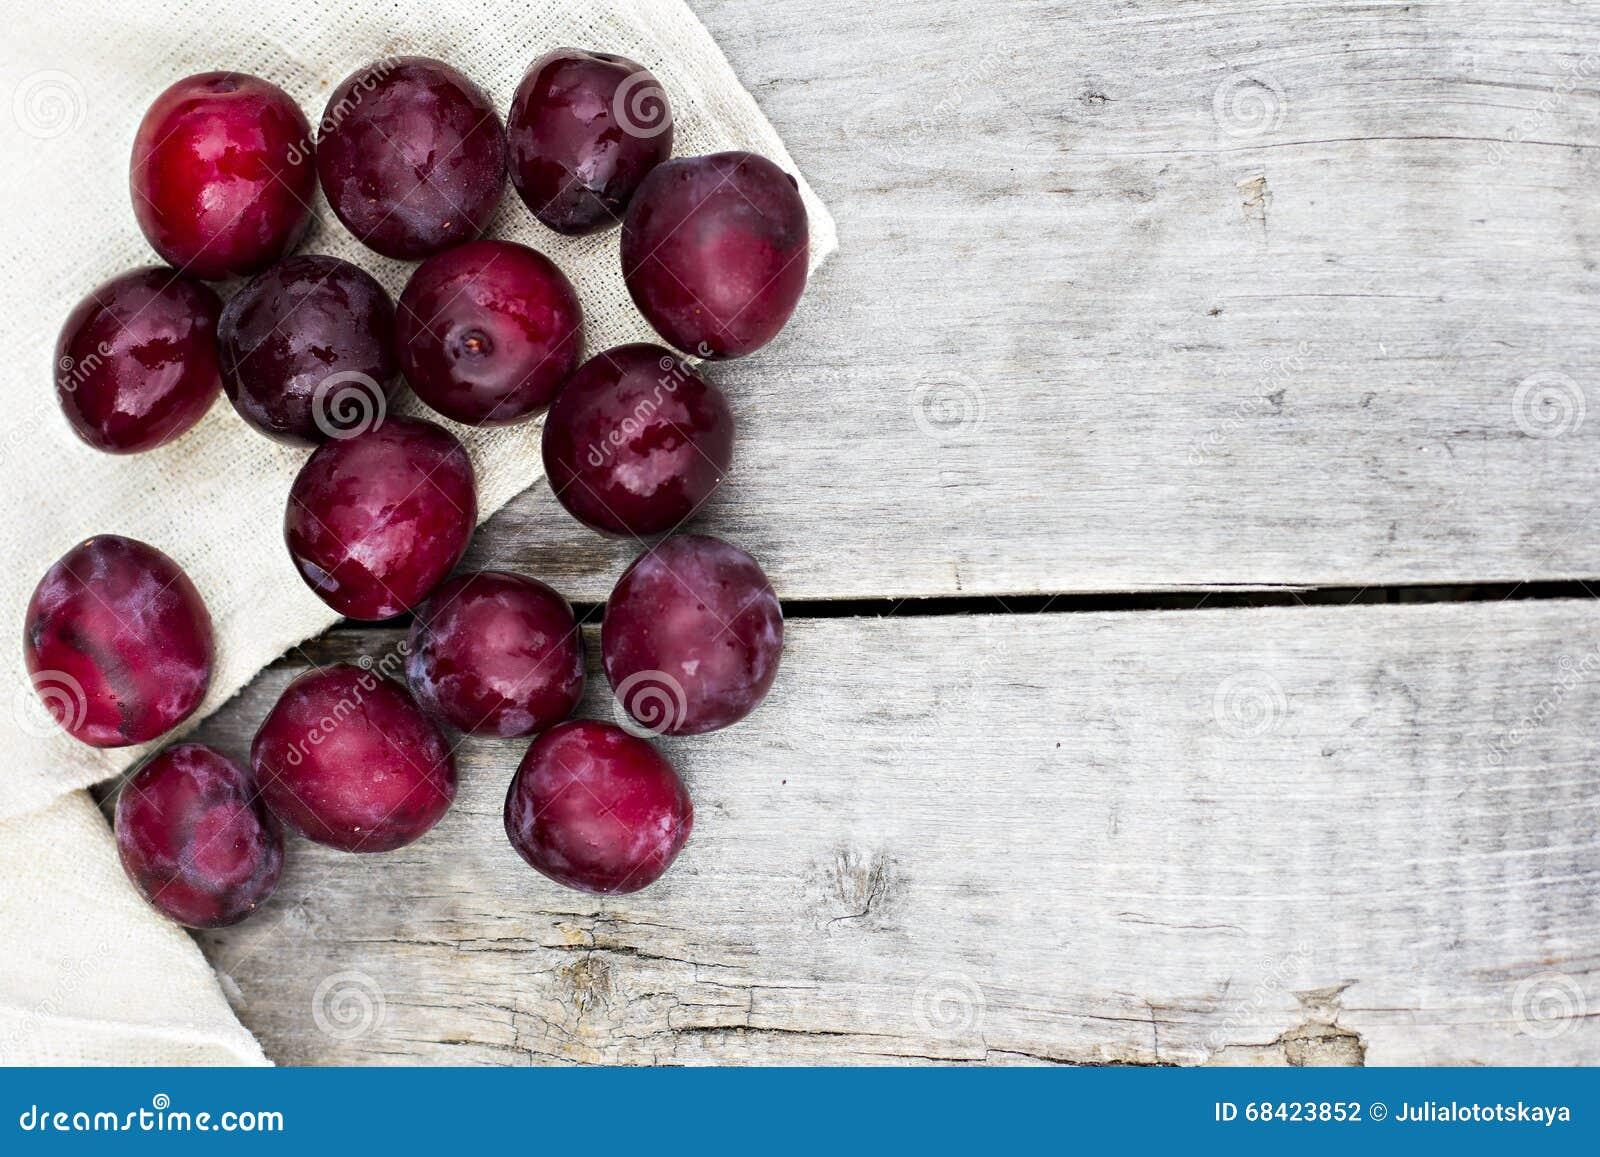 Sweet plums